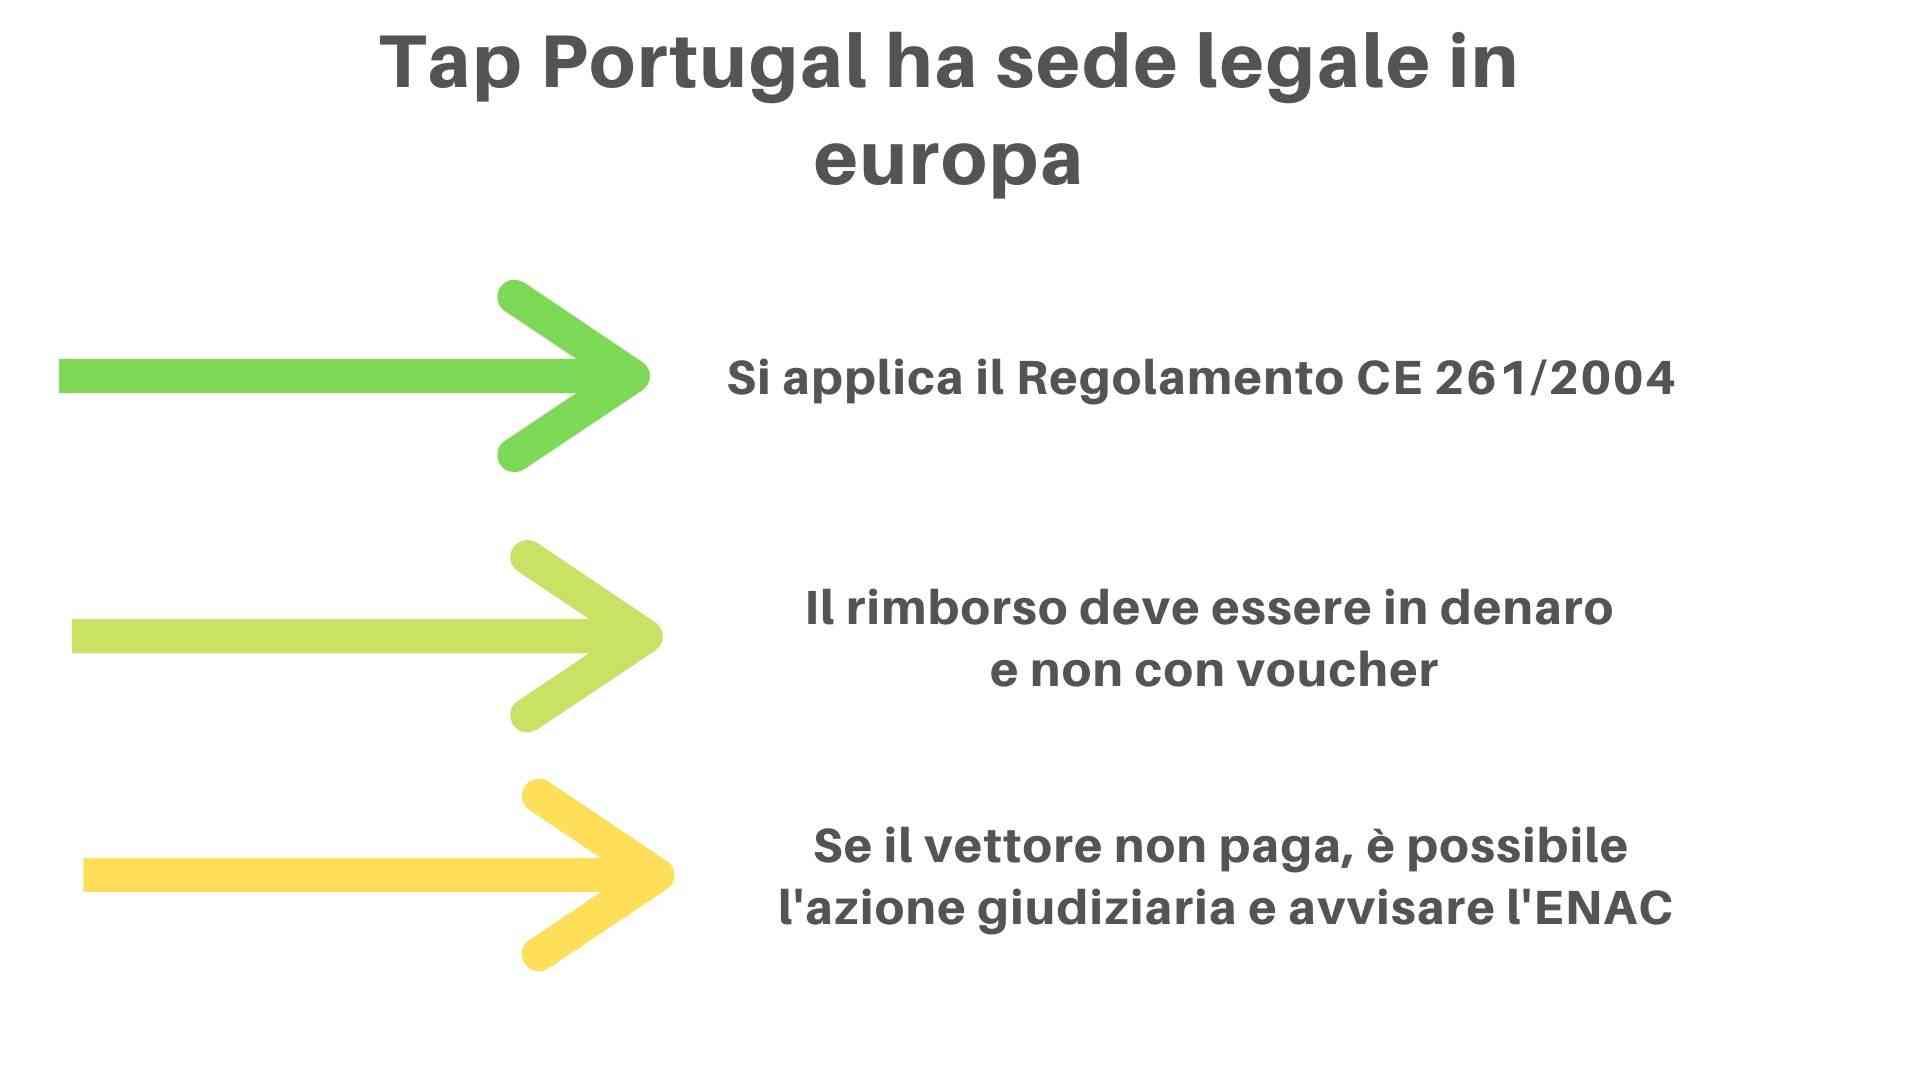 Reclami Tap Portugal e rimborso